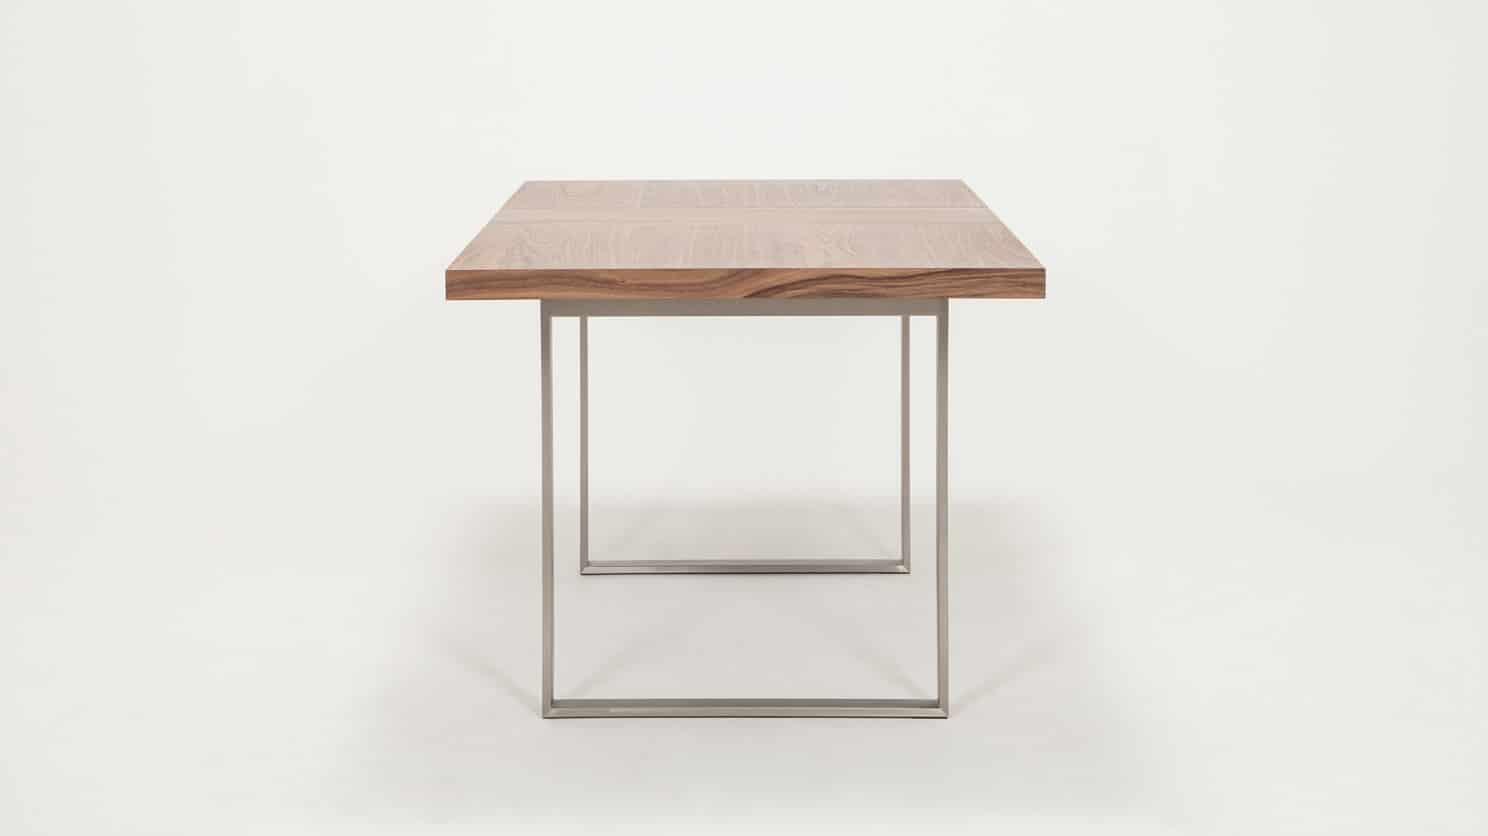 3020 340 par 7 dining tables hatch dining table walnut side 02